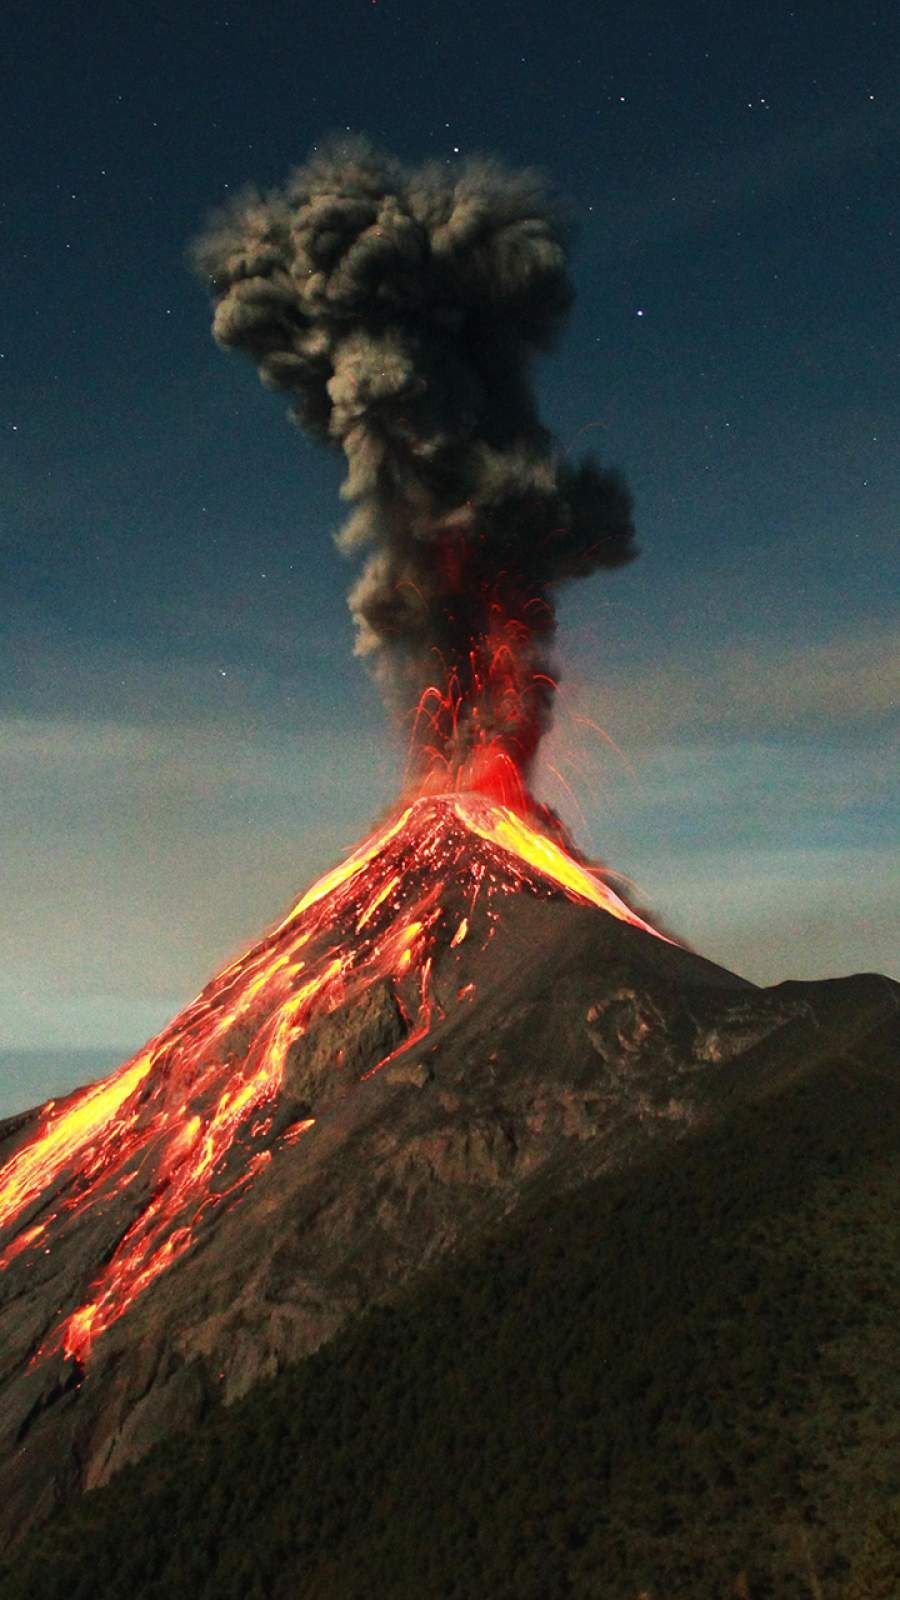 Guatemala Volcano Eruption IPhone Wallpaper Volcano wallpaper 900x1600